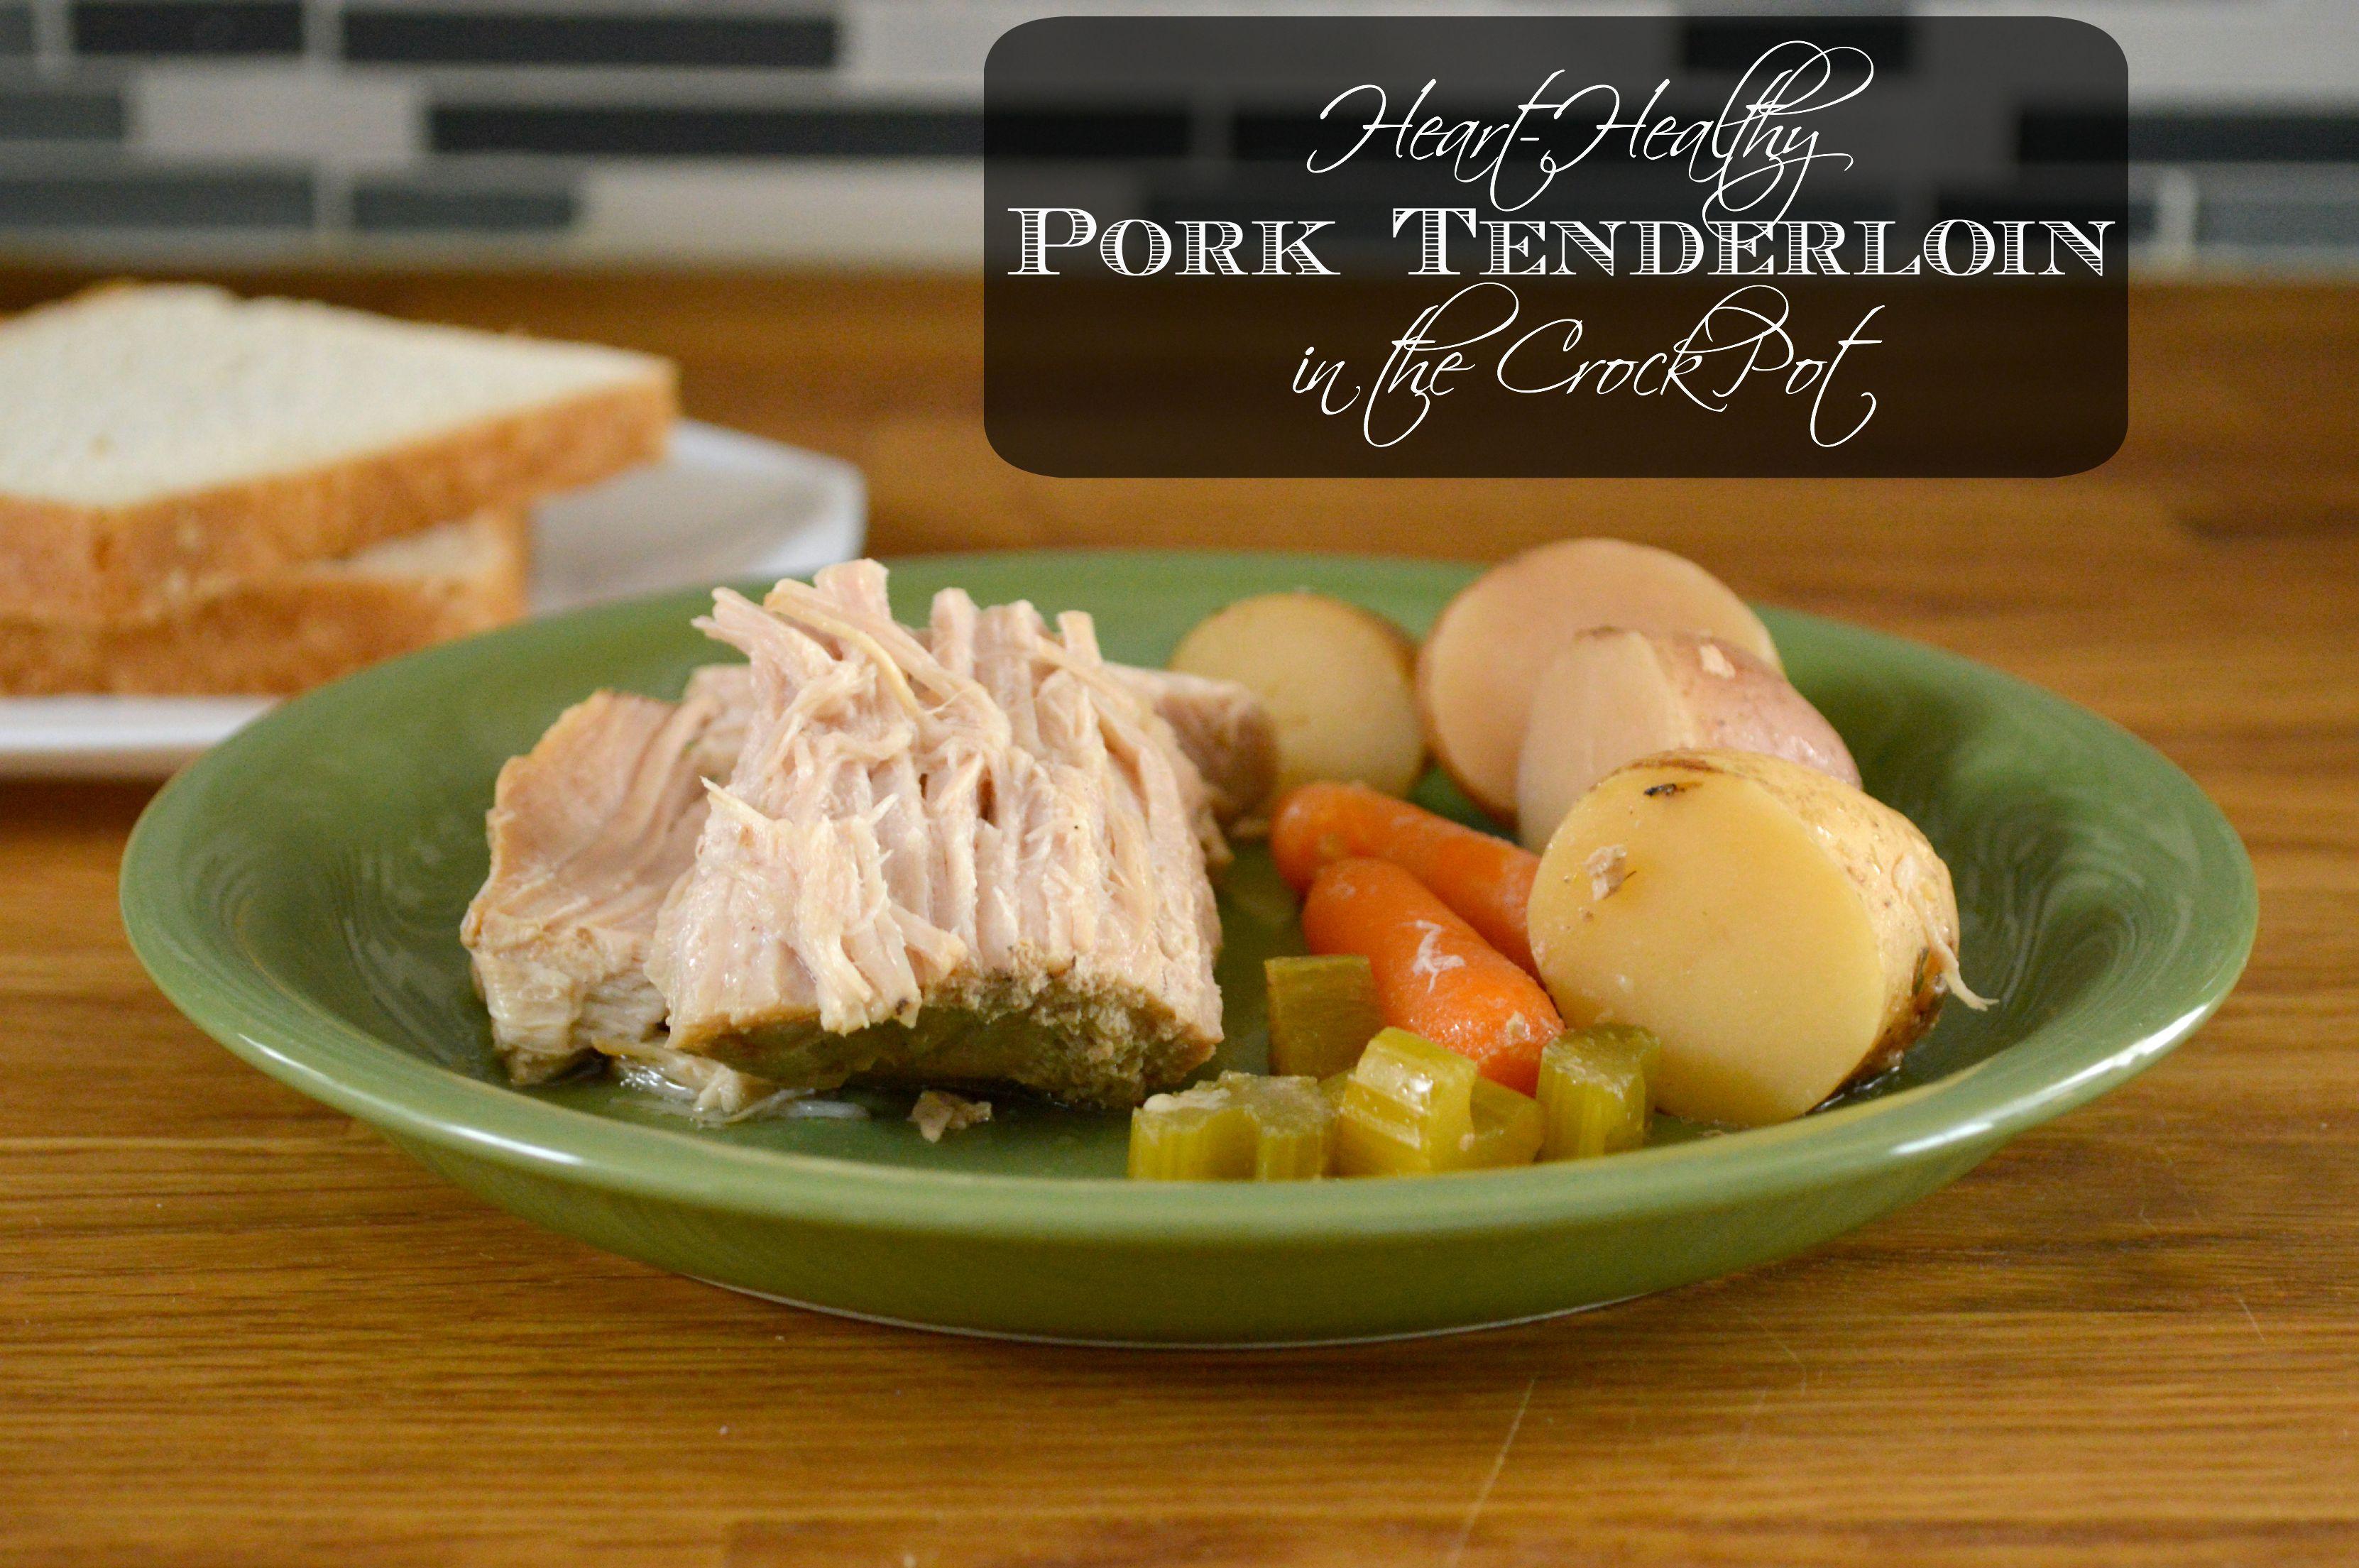 Heart Healthy Pork Recipes  Heart Healthy Crock Pot Pork Tenderloin SoFabFood